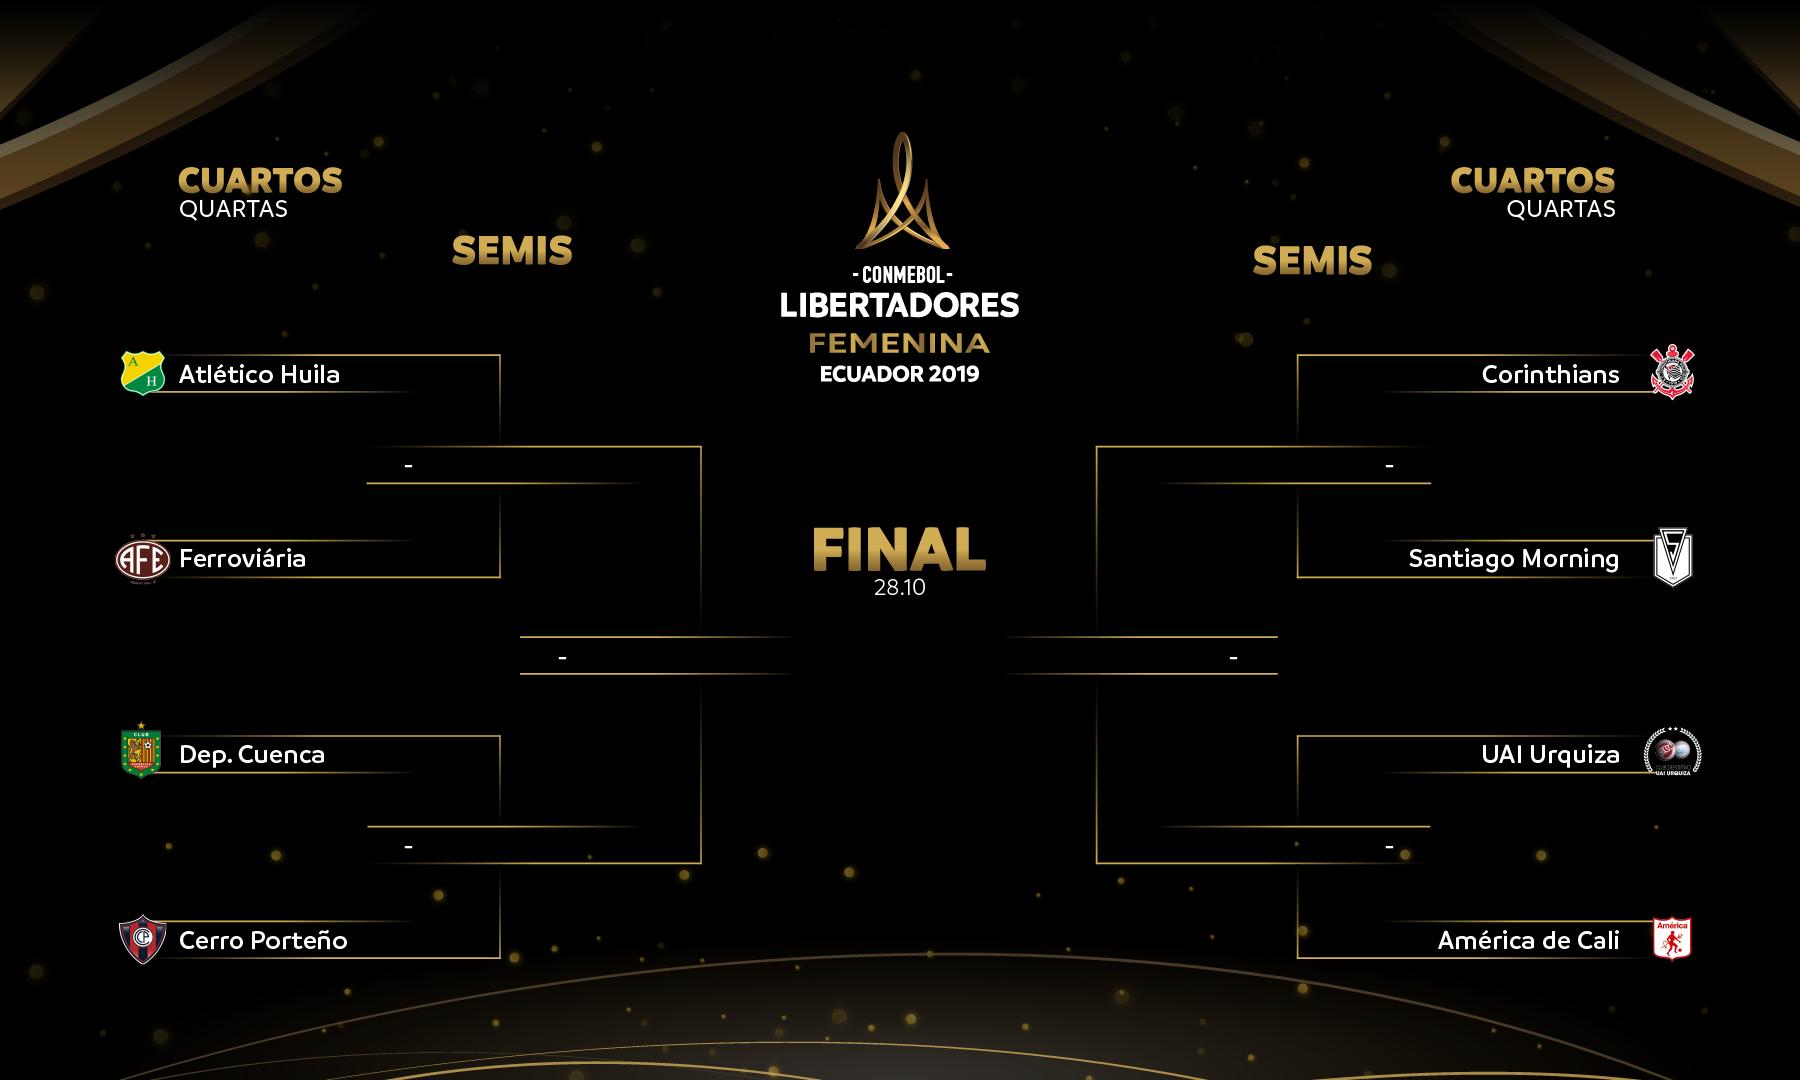 Quartas de final - Libertadores Feminina